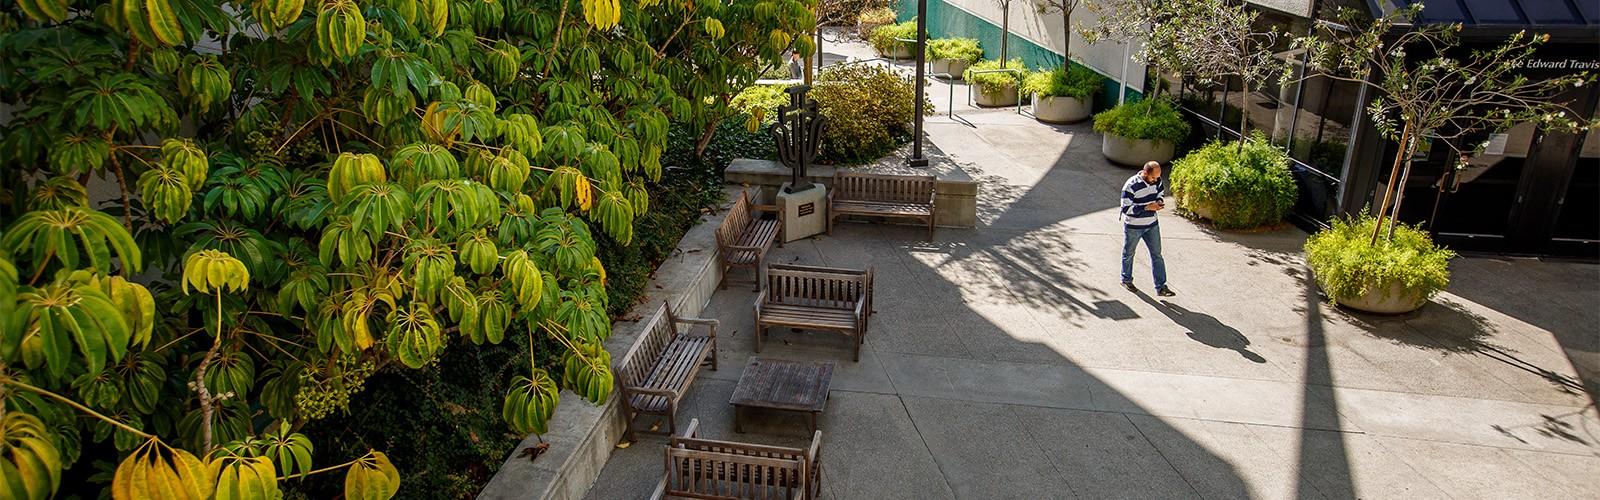 SOP Courtyard